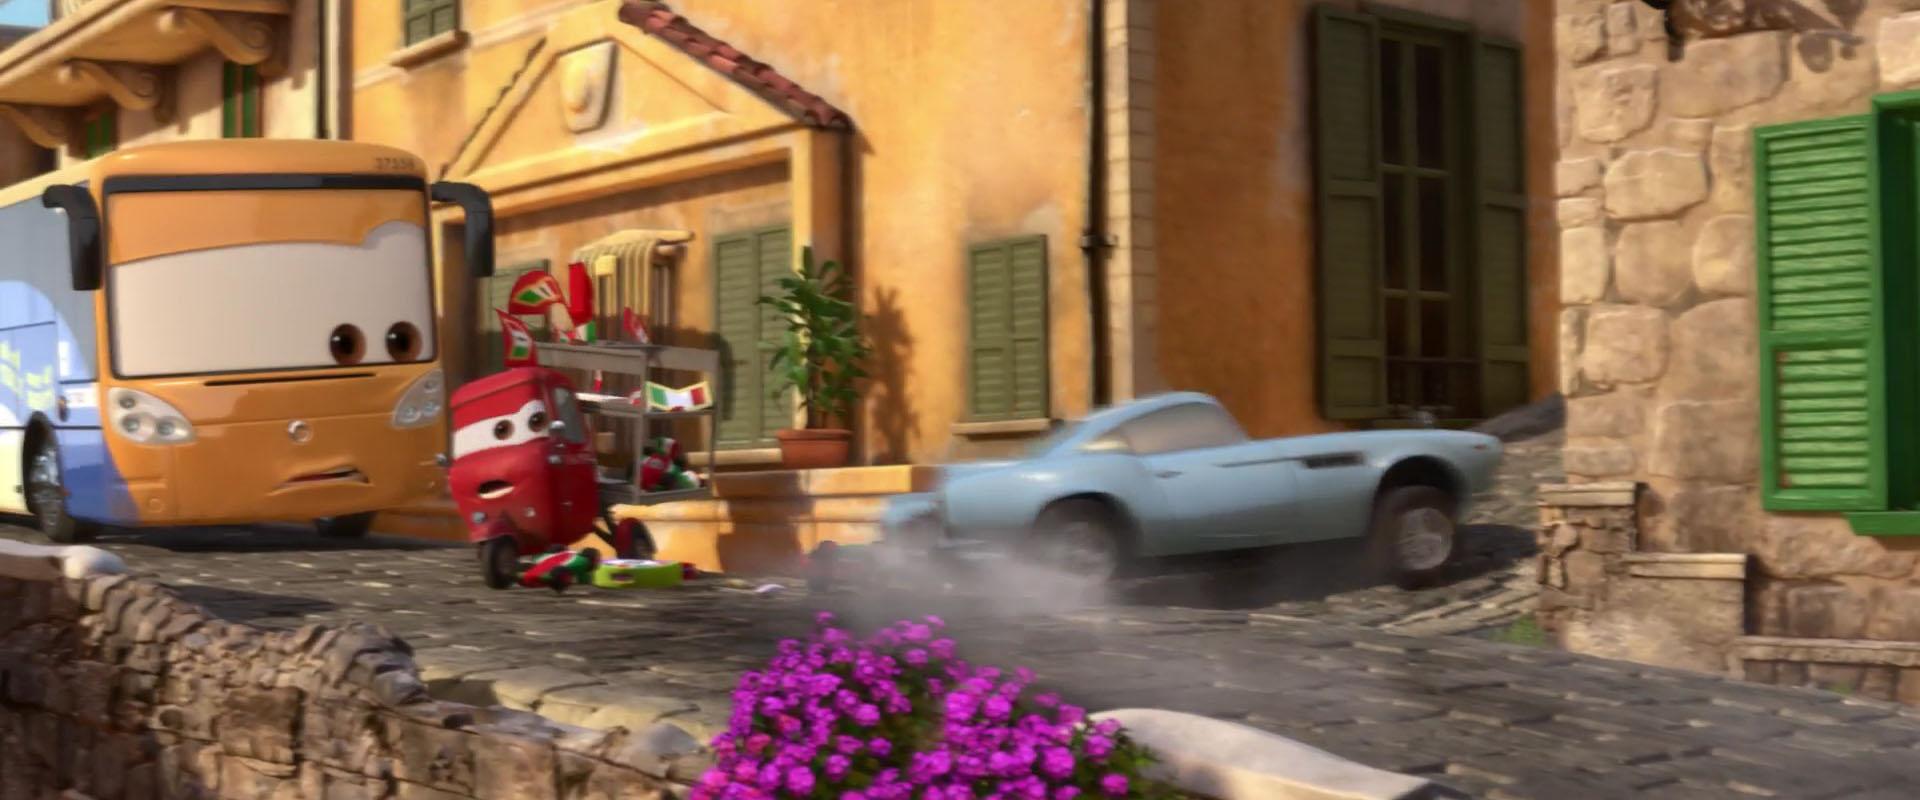 trike feldman personnage character pixar disney cars 2